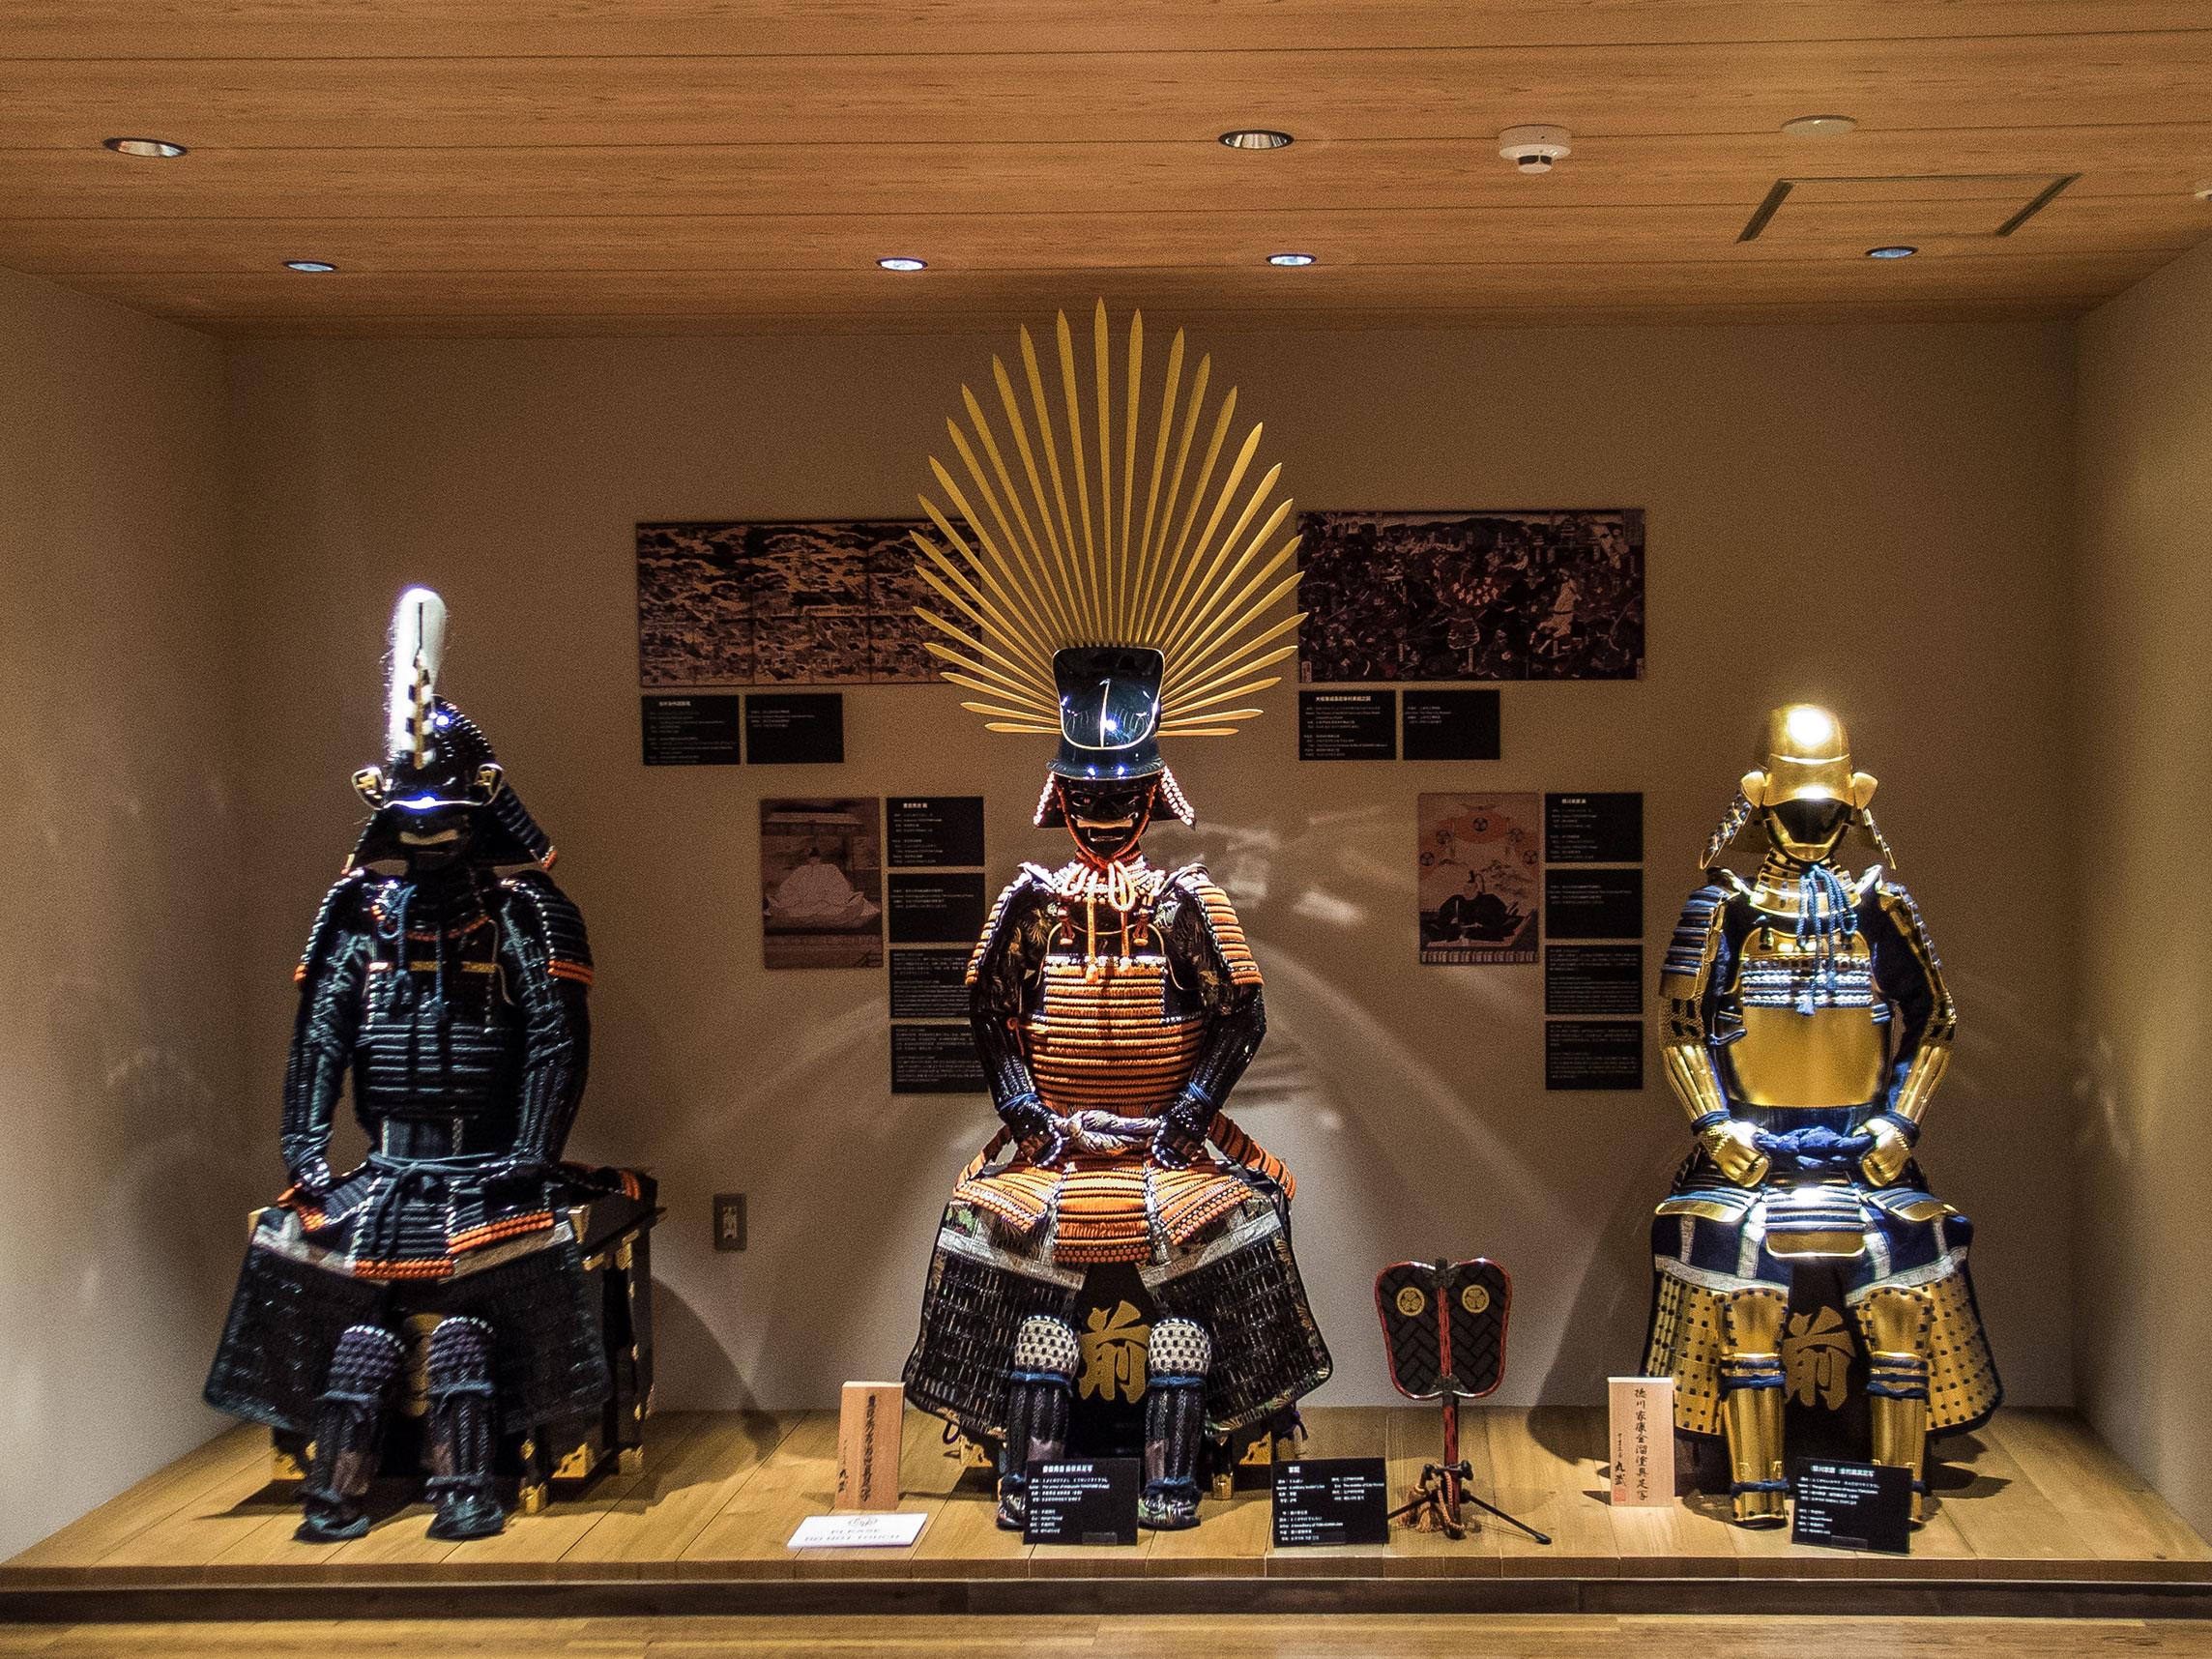 Samurai & Ninja Musseum with ExperIence